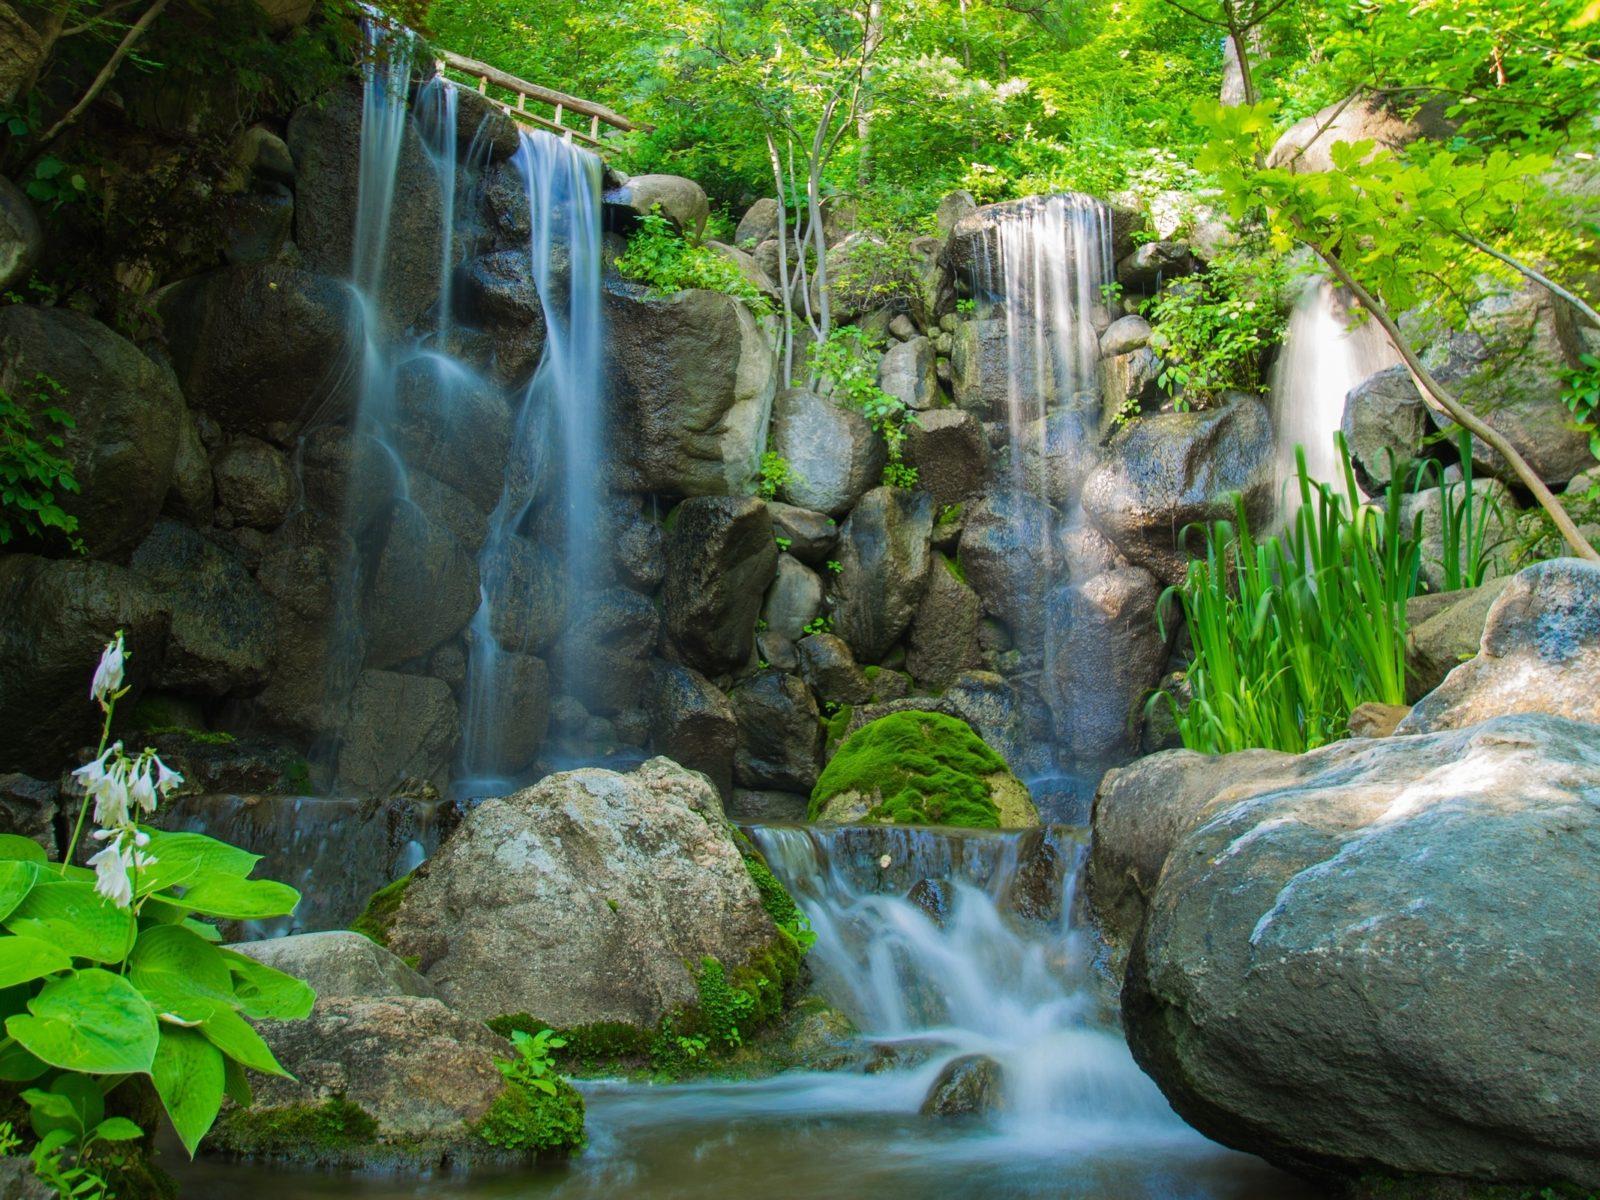 Havasu Falls Wallpaper Waterfall River Rocks Plants Trees Nature 2560x1600